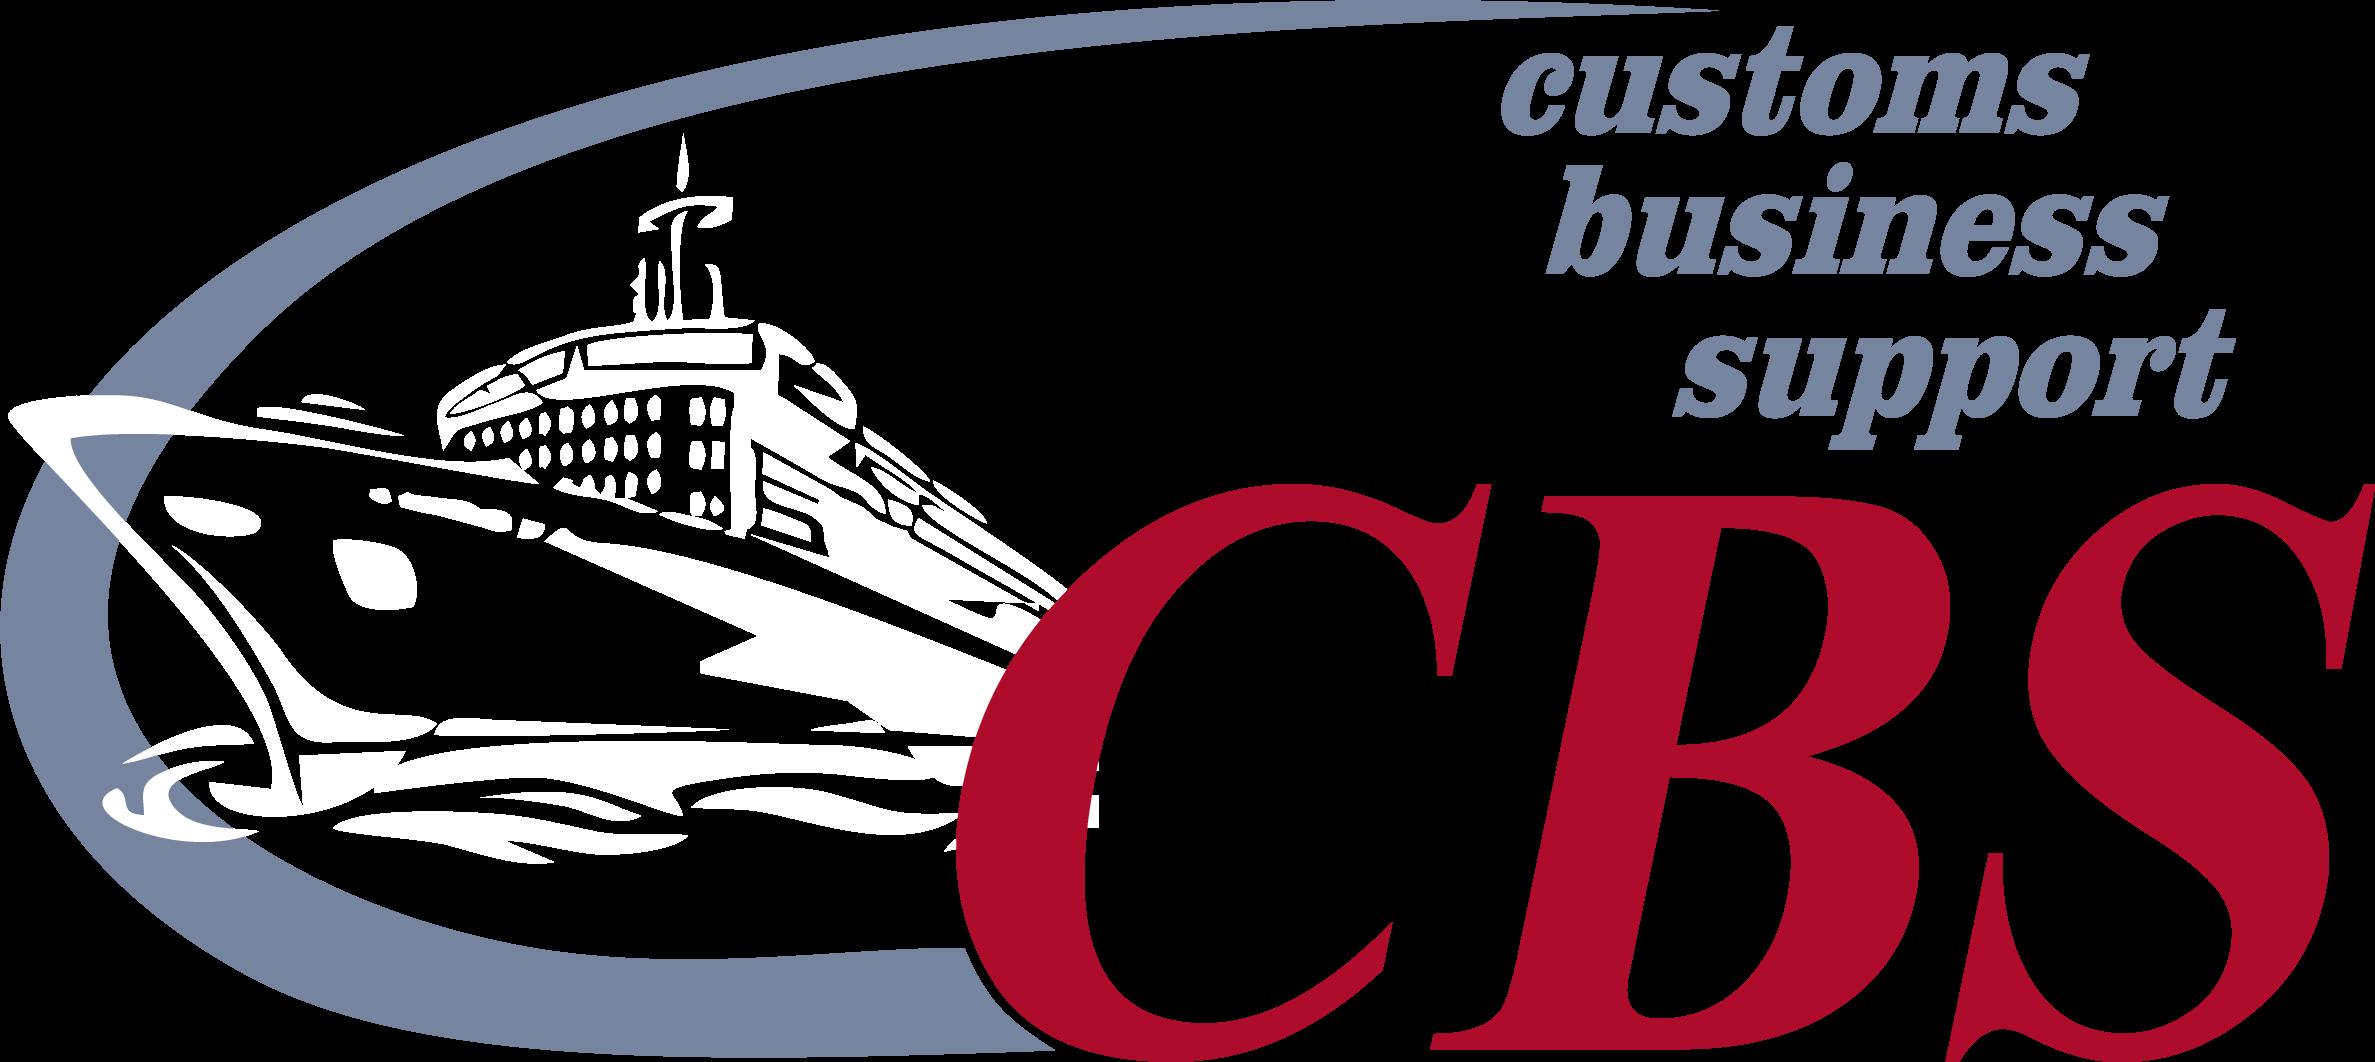 logo-cbs